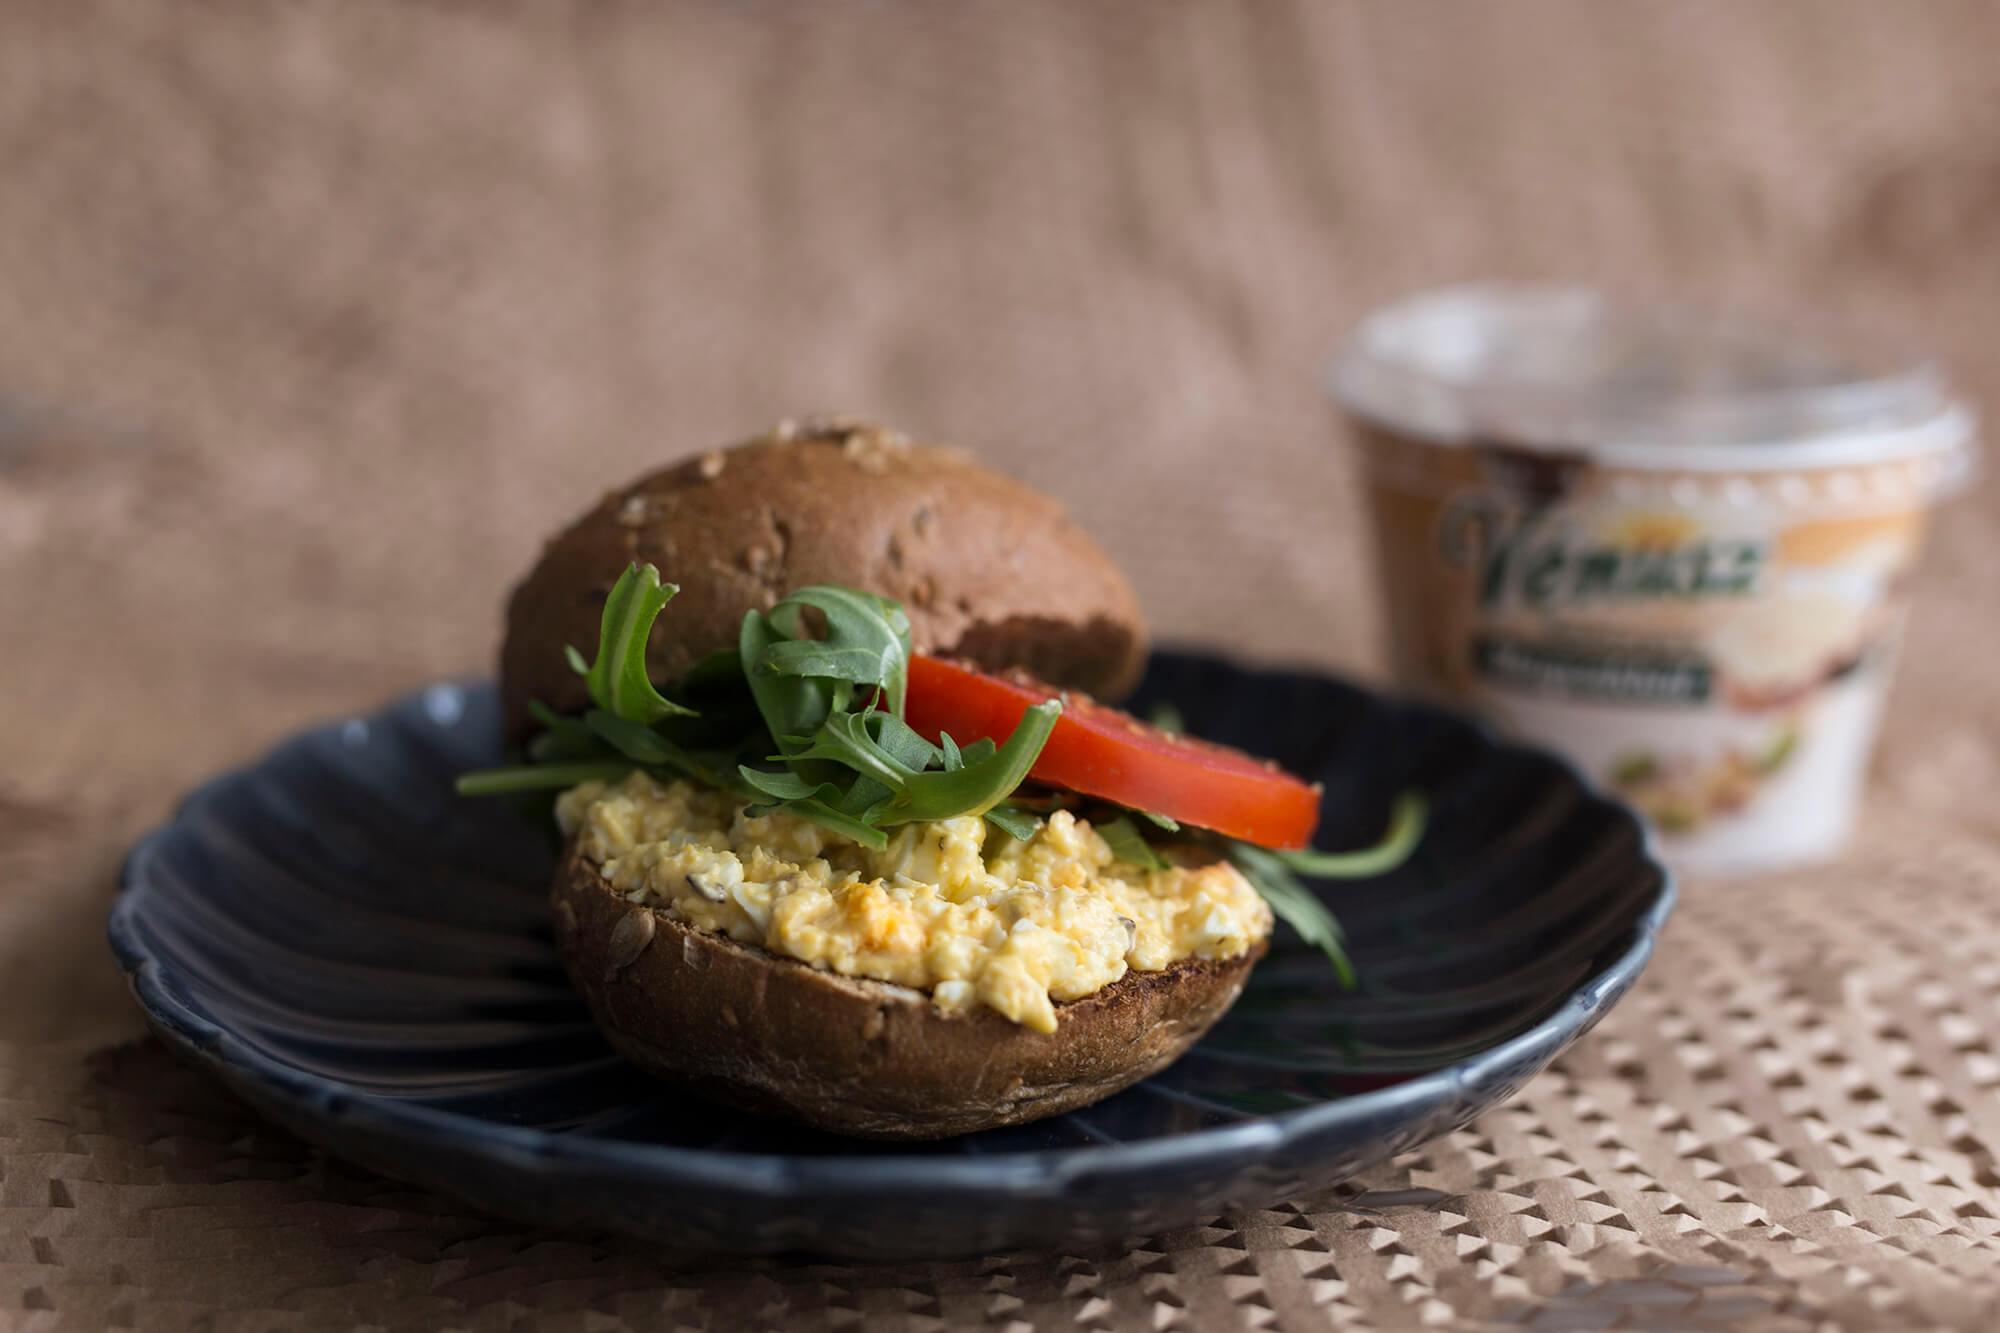 Egg sandwich, health, fitness, gastronomy, recipe, workout, sandwich recipe